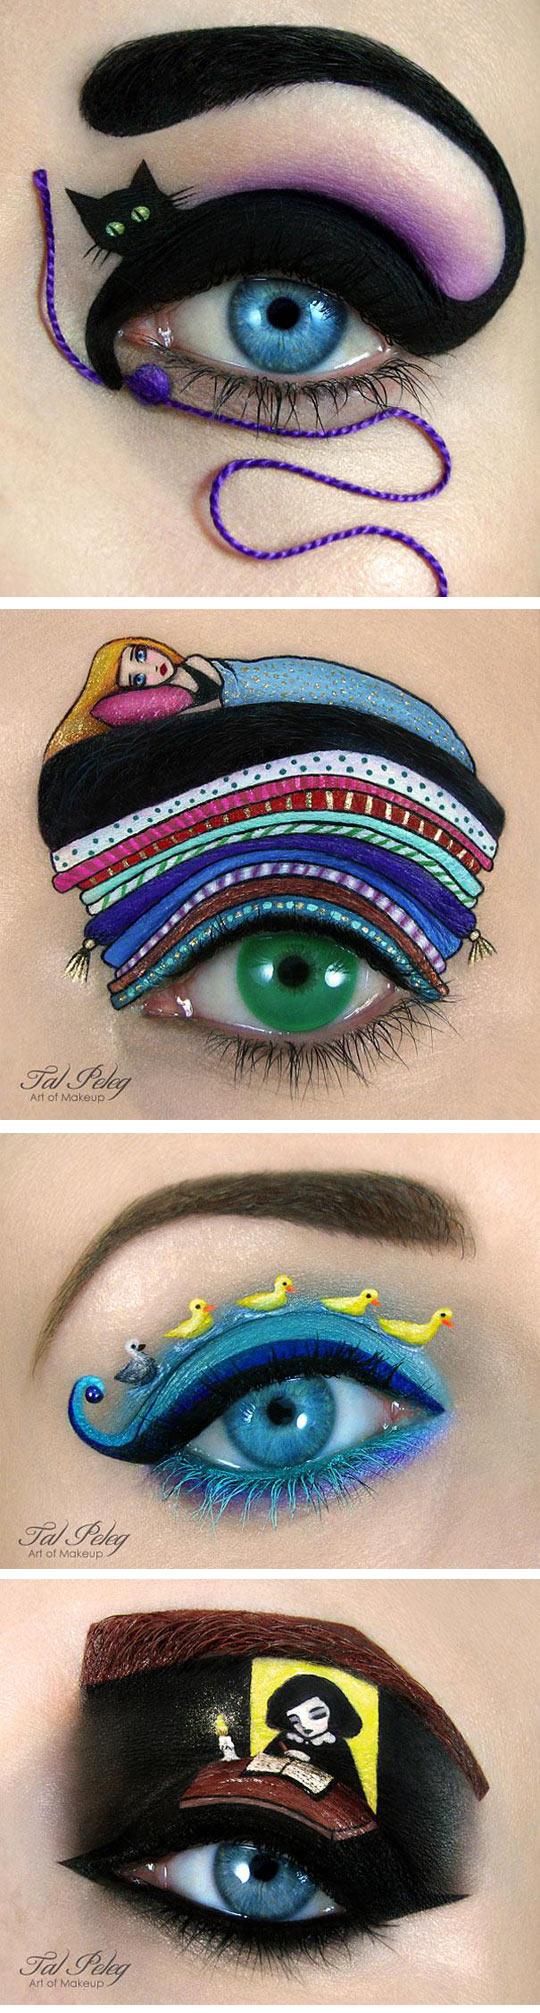 cool-eye-makeup-cat-colors-art-wool